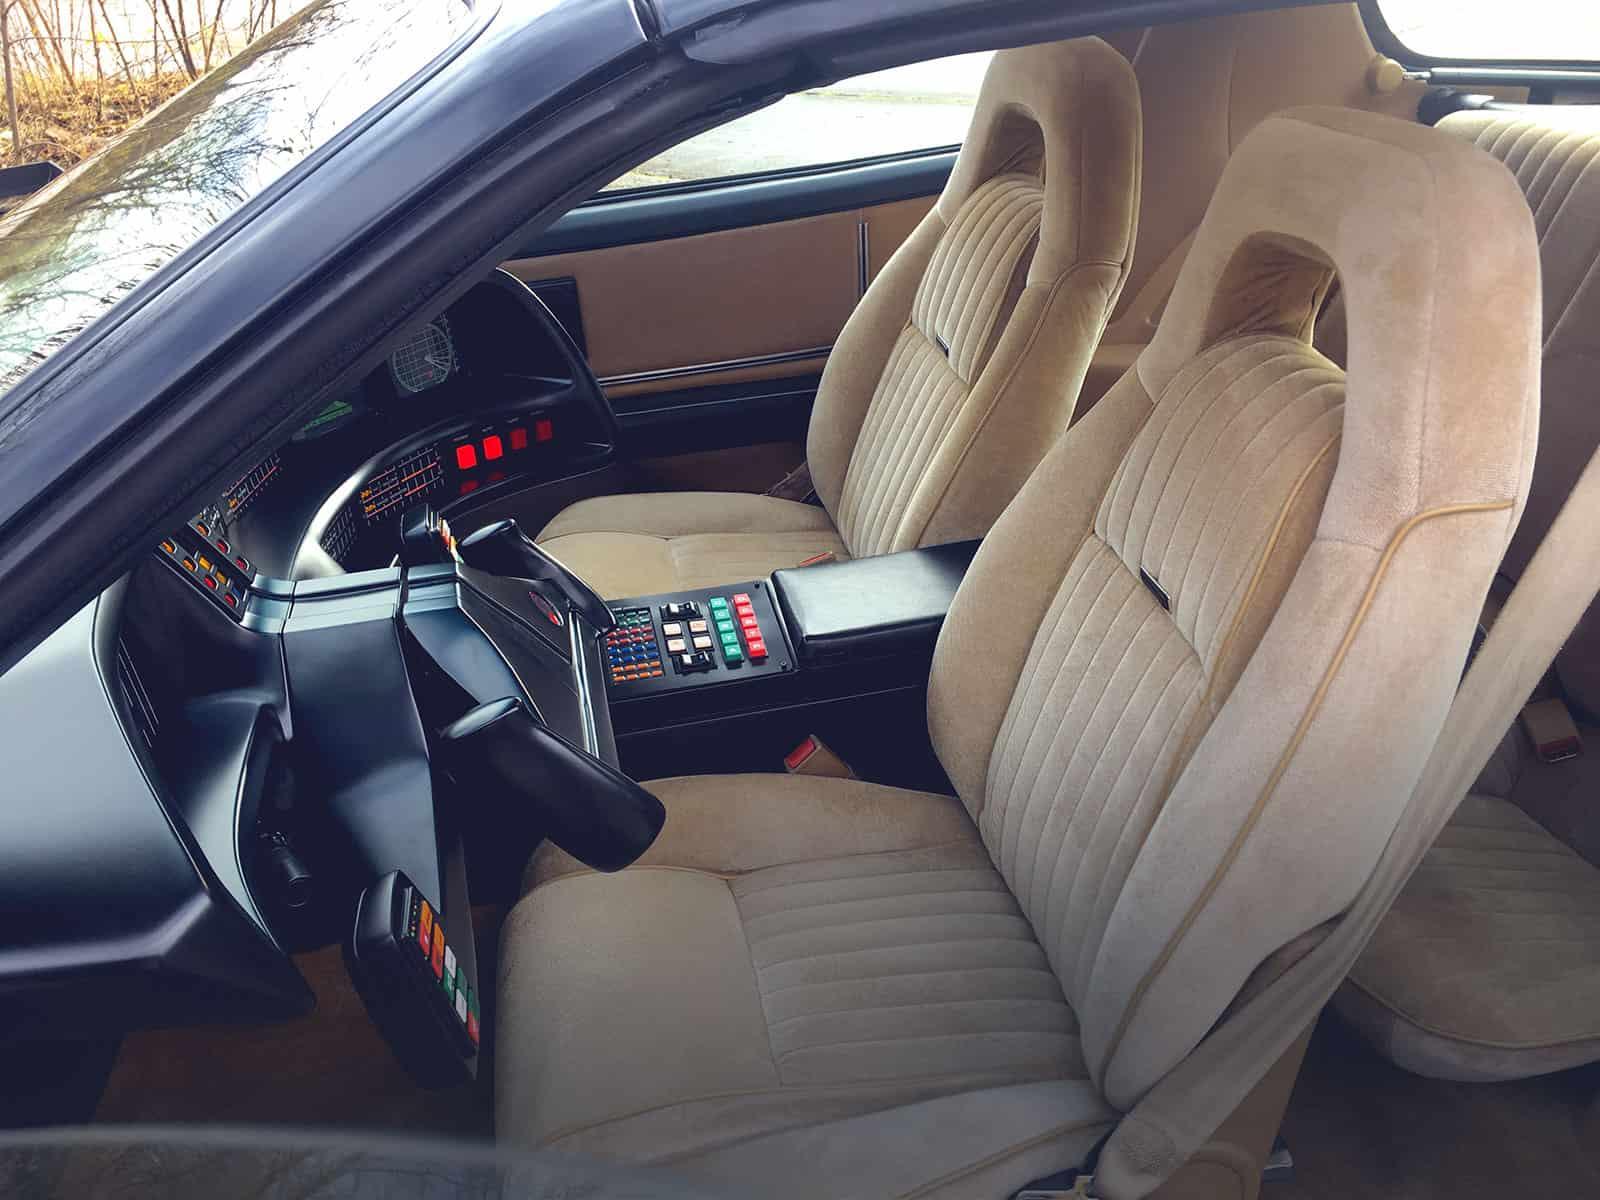 KITT Replika PMD Sitze Knight Rider of Germany